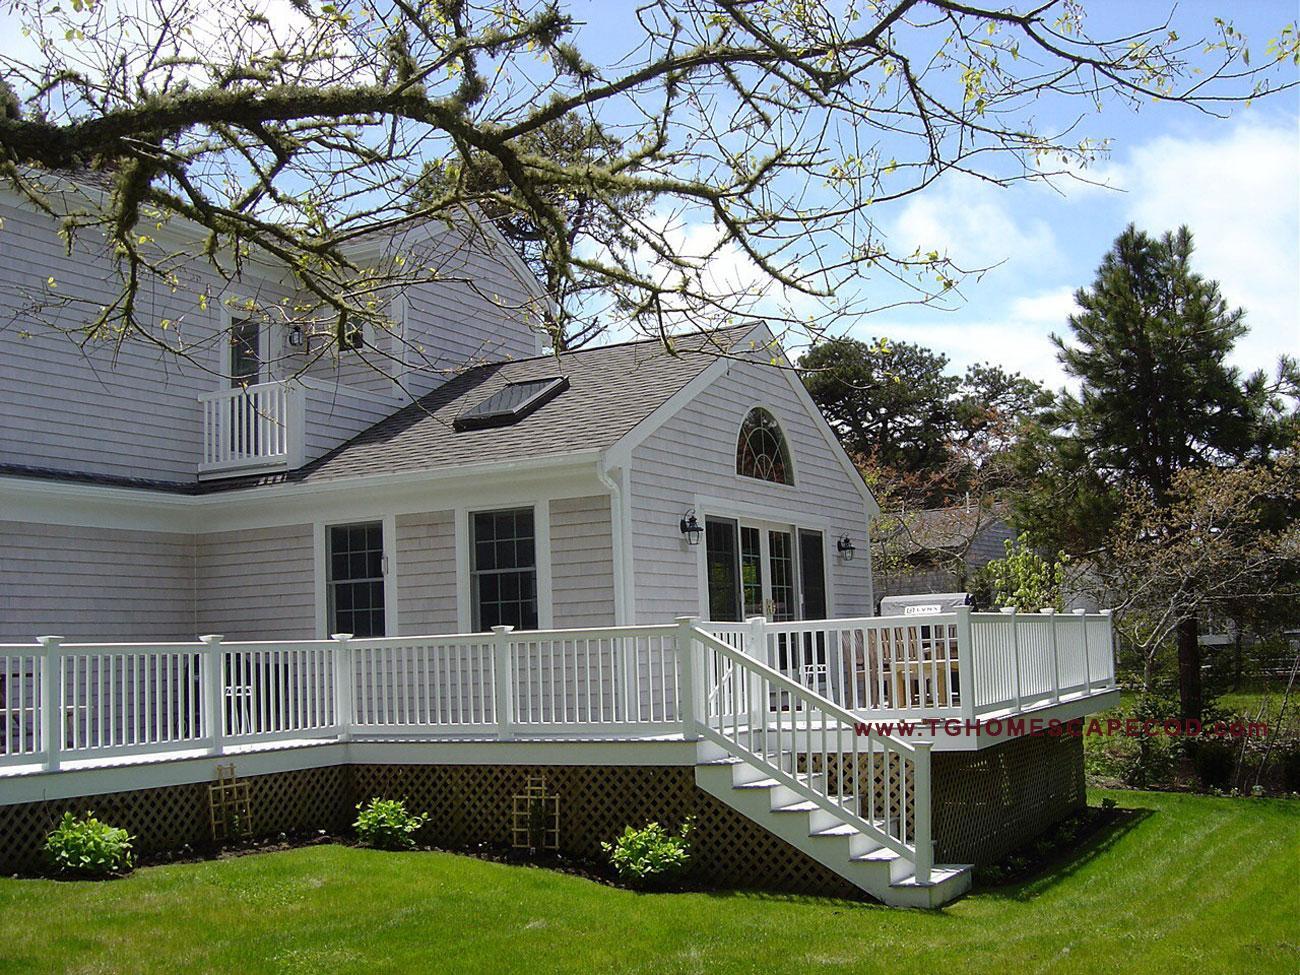 Tg homes cape cod home design build services new for Cape cod builder